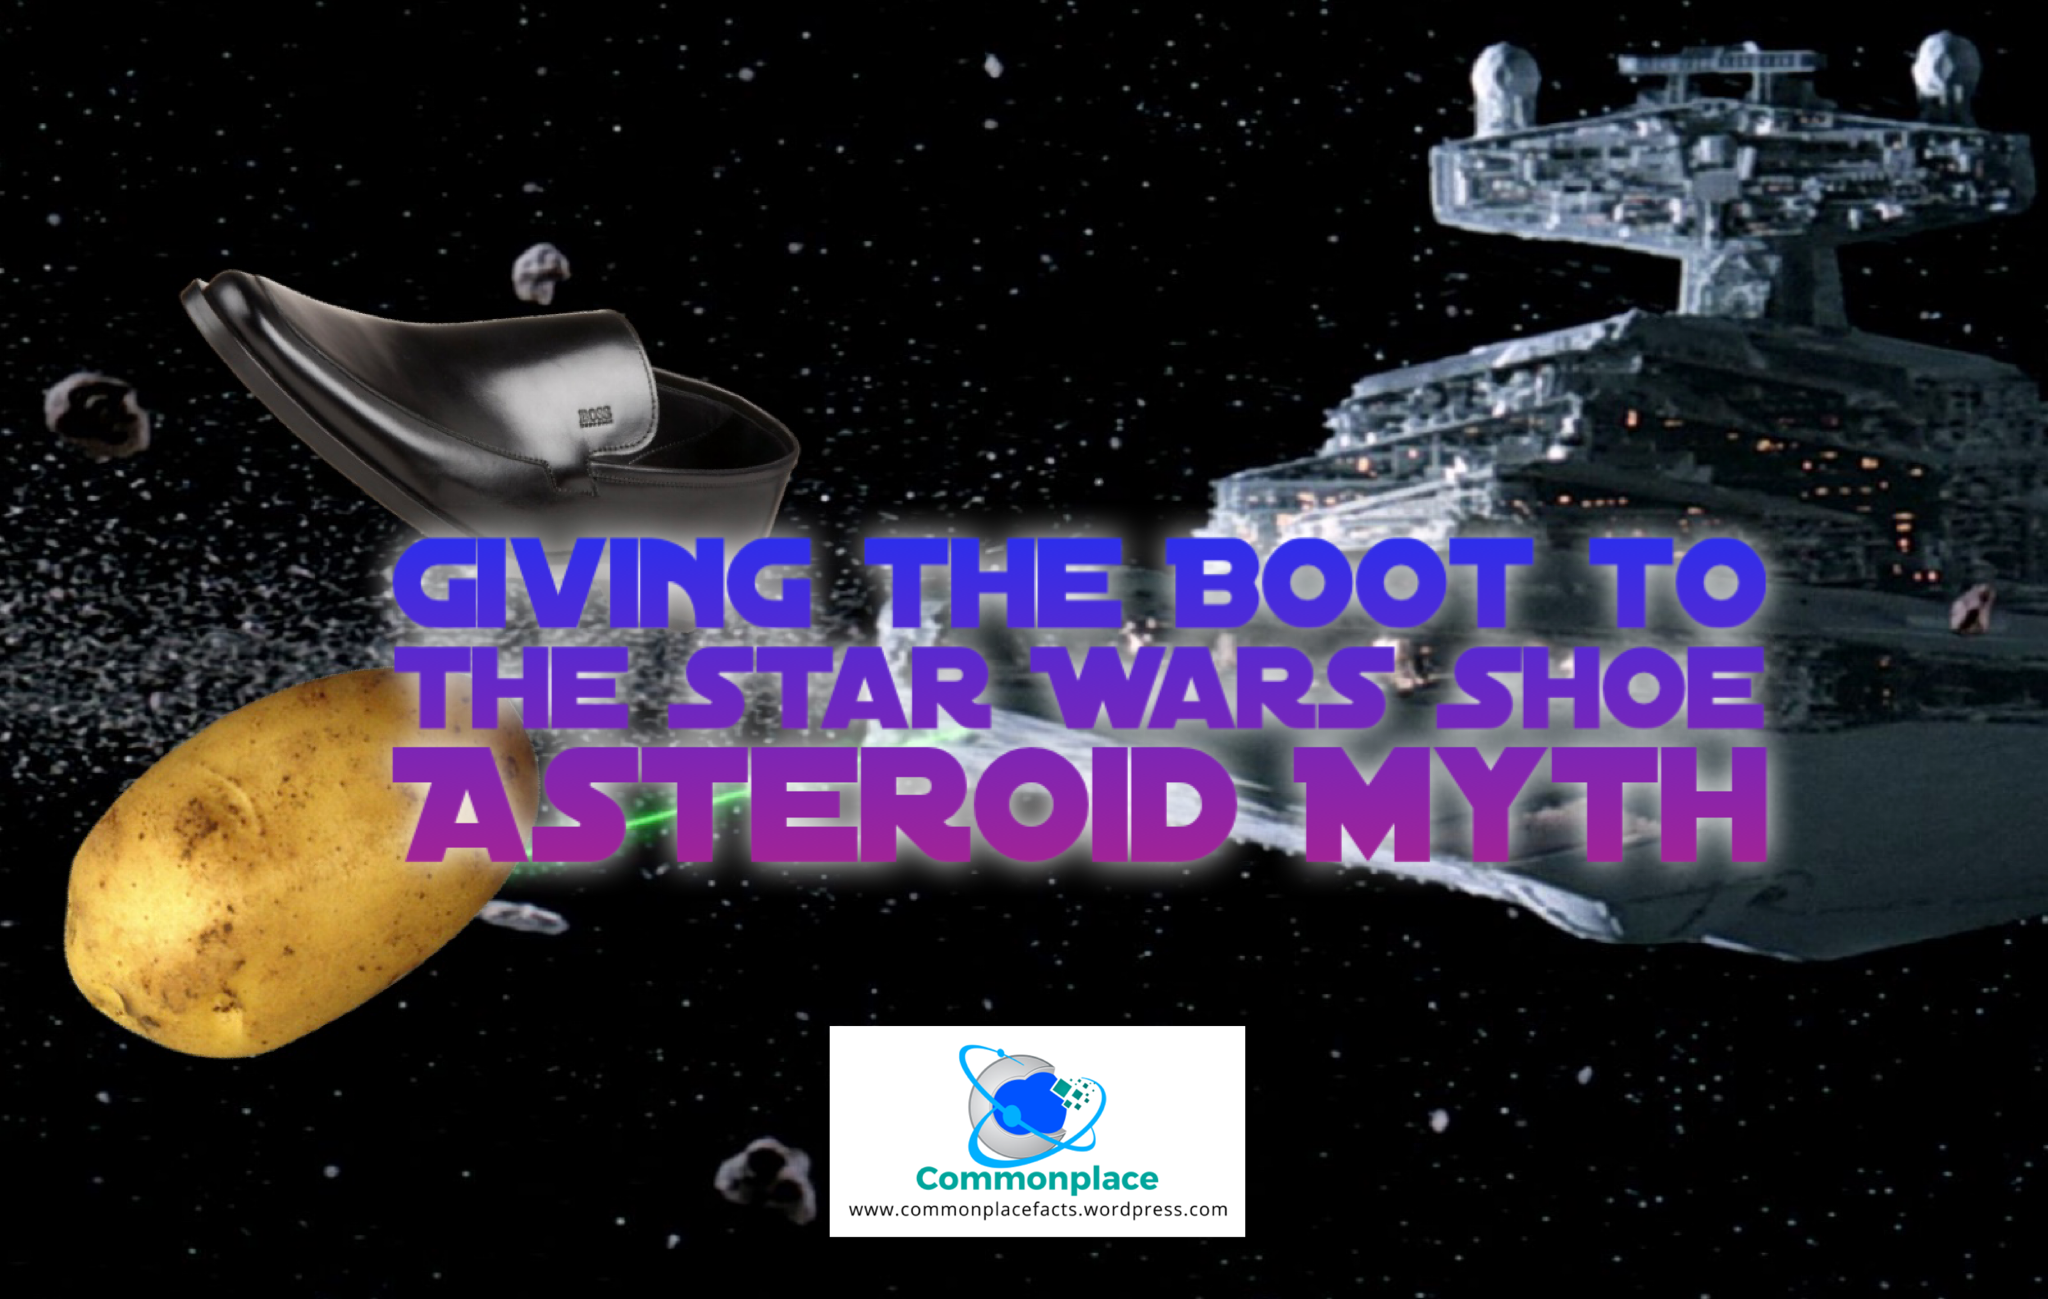 Star Wars Asteroid Shoe Potato asteroids